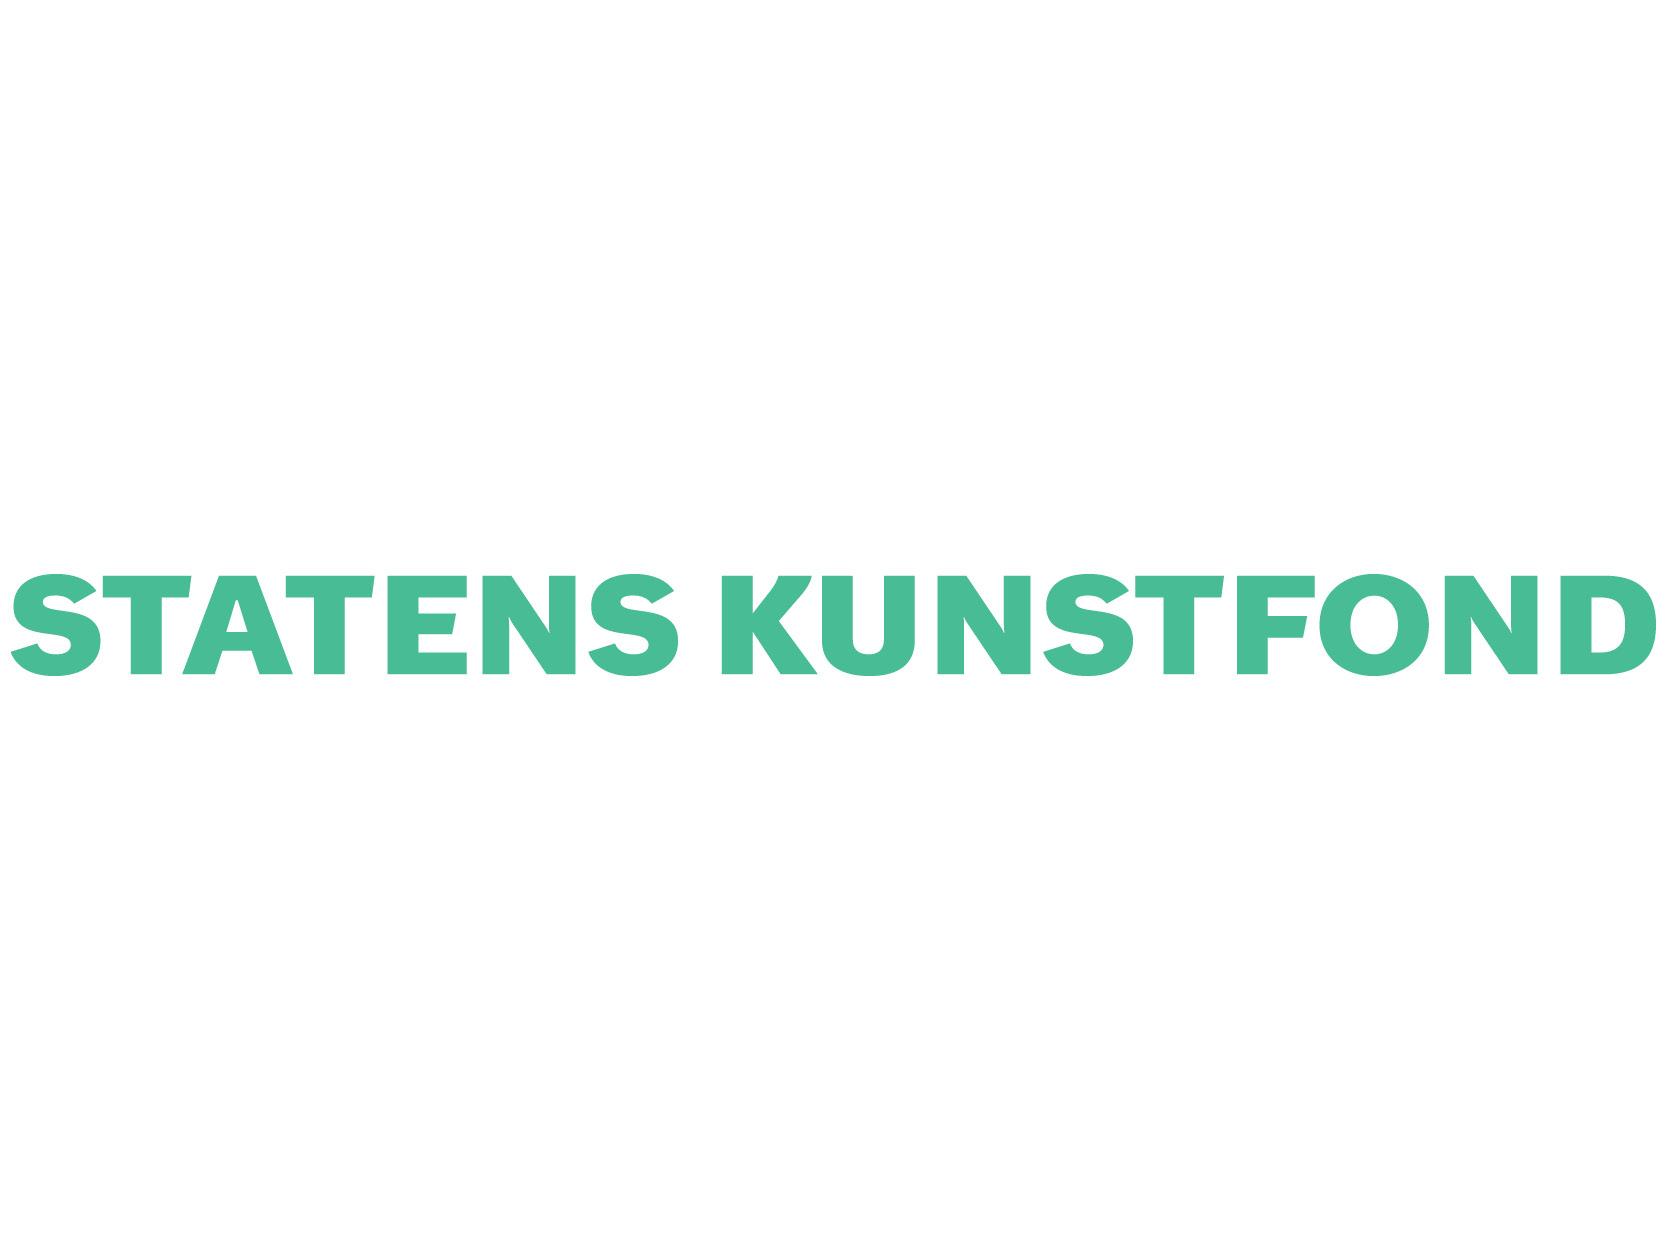 Statens Kunstfond